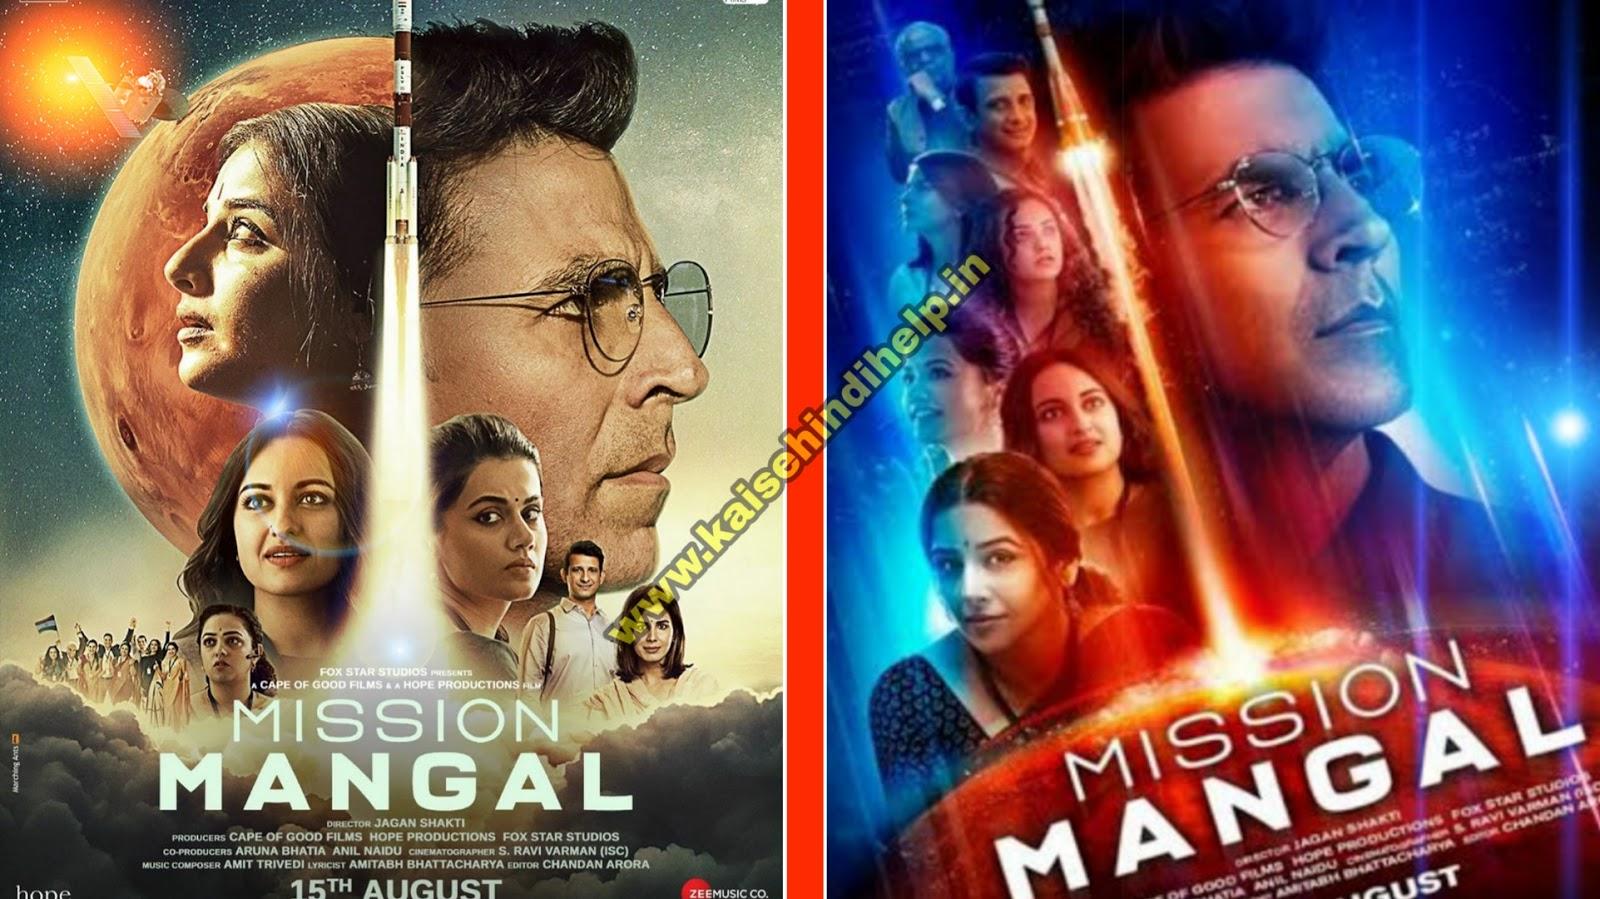 Download Mission Mangal 2019 Movie Full HD